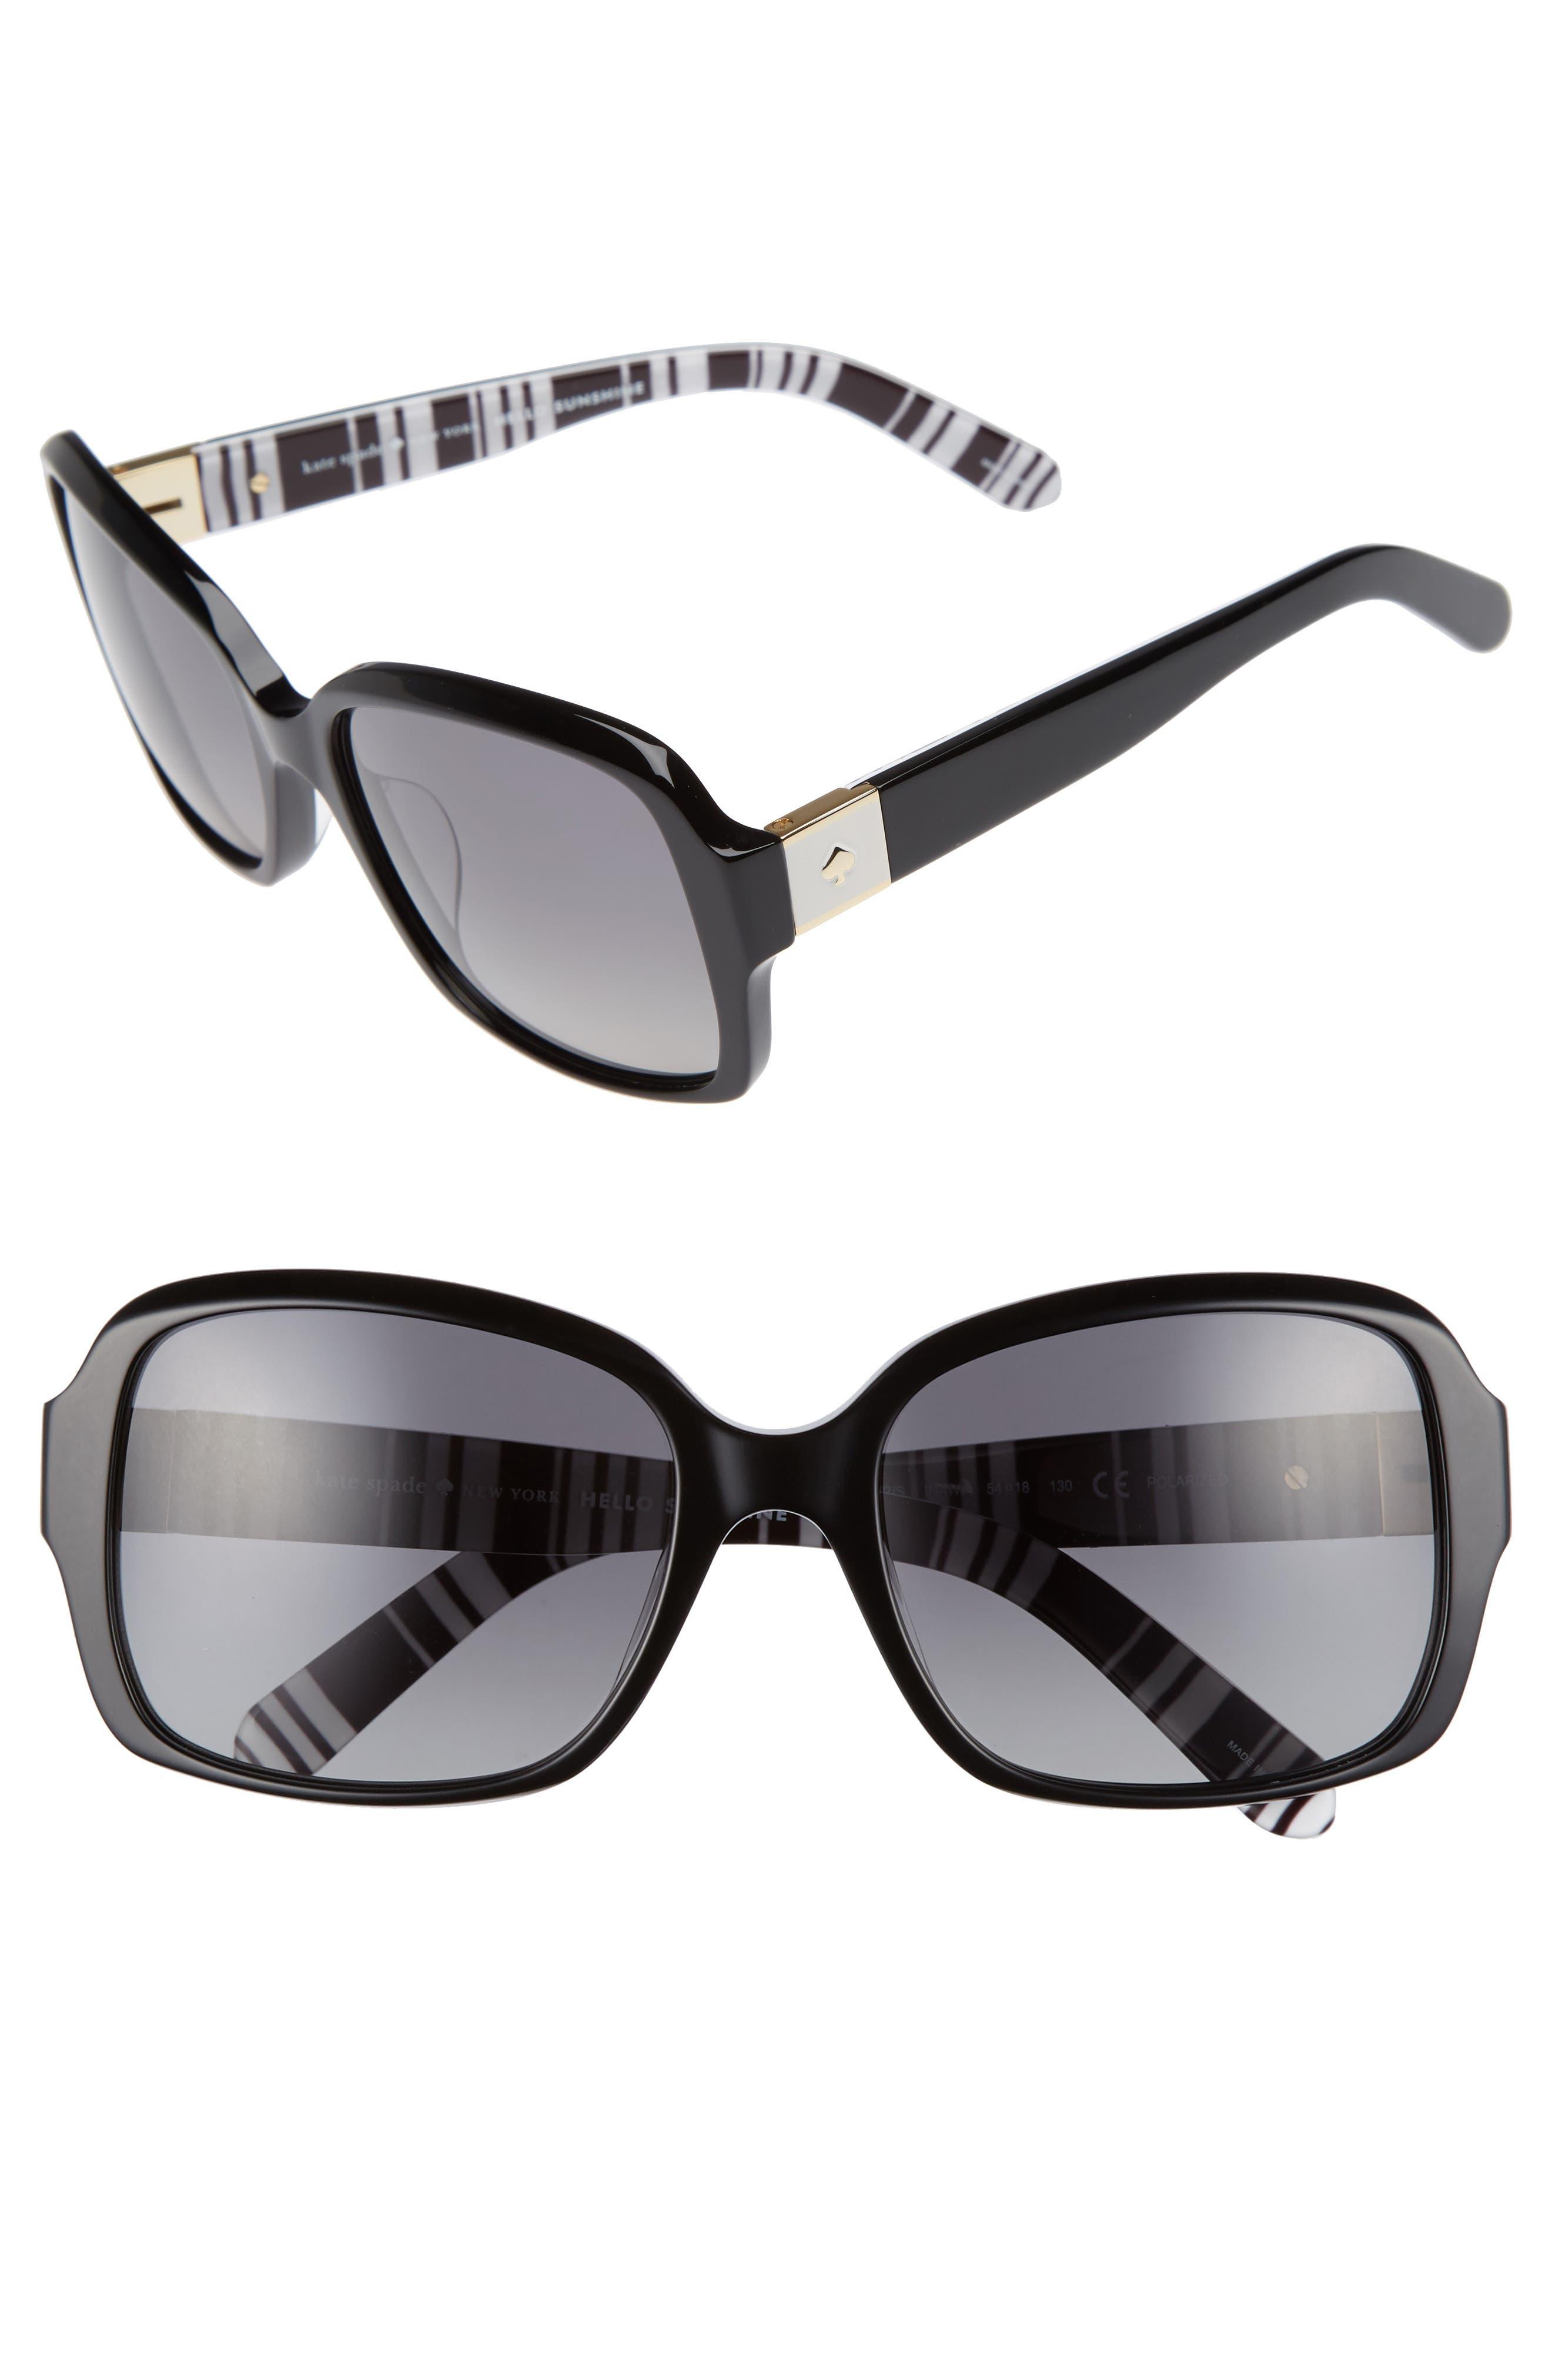 Main Image - kate spade new york annor 54mm polarized sunglasses